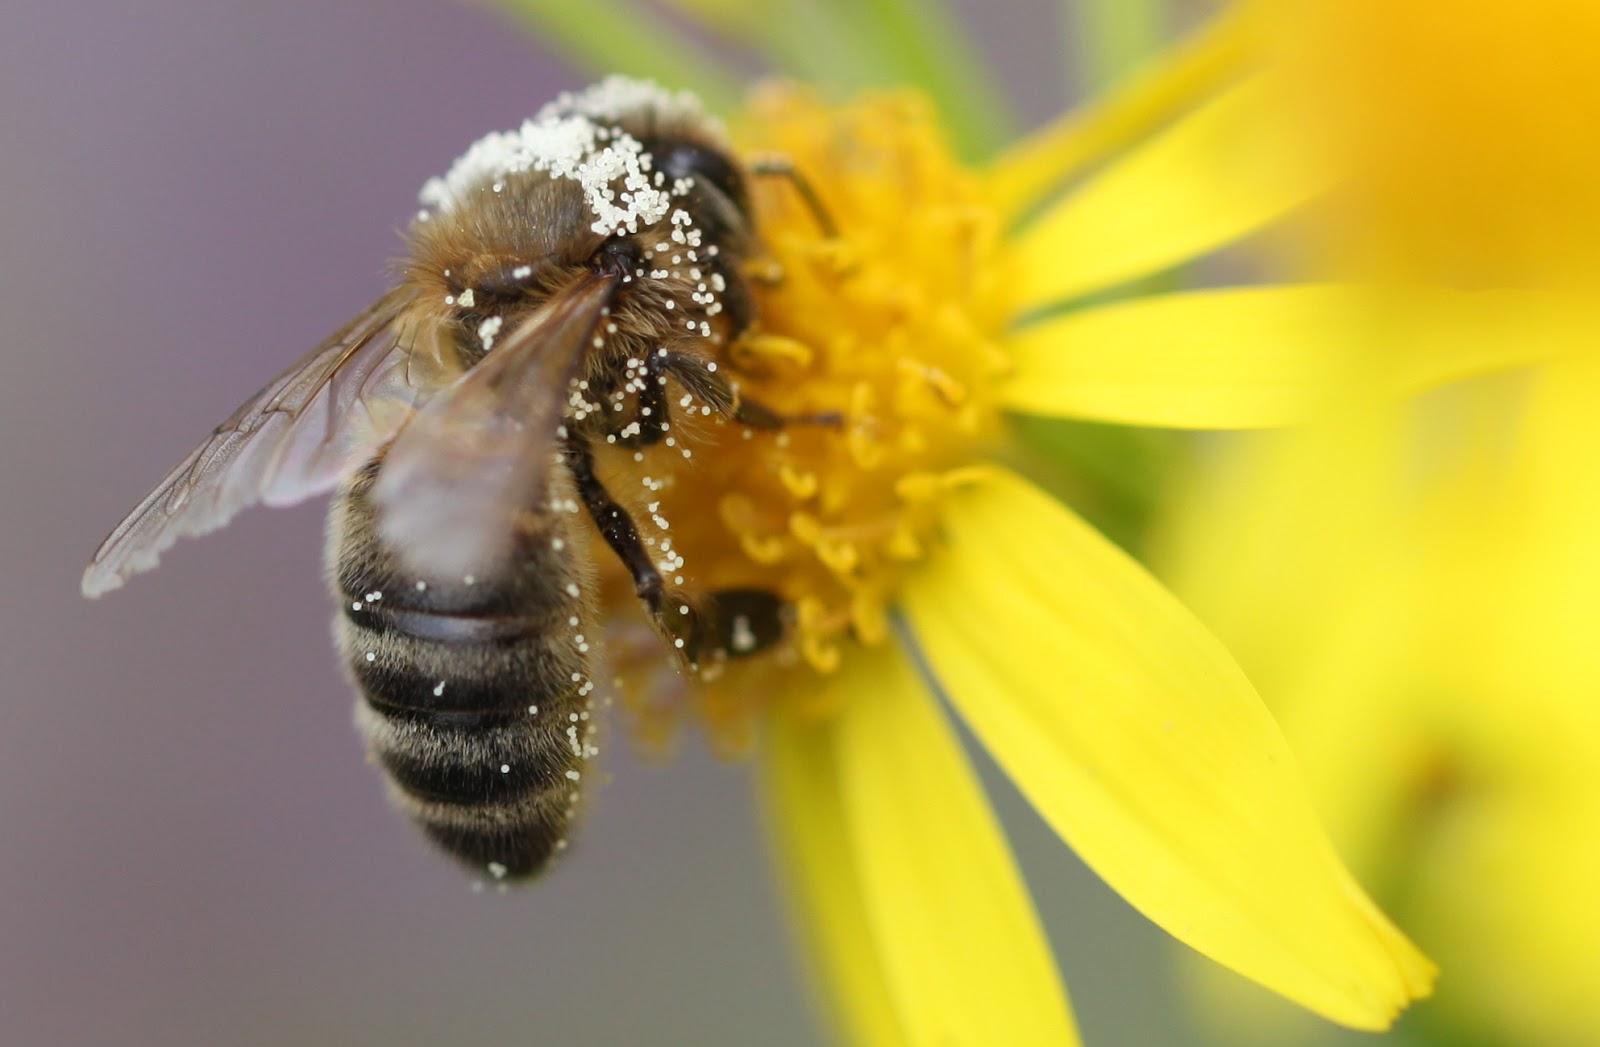 http://1.bp.blogspot.com/-5MnsklW_2tY/UVKoQELwKUI/AAAAAAAAAMc/WqGkNGJsWd8/s1600/honeybee+on+ragwort.JPG